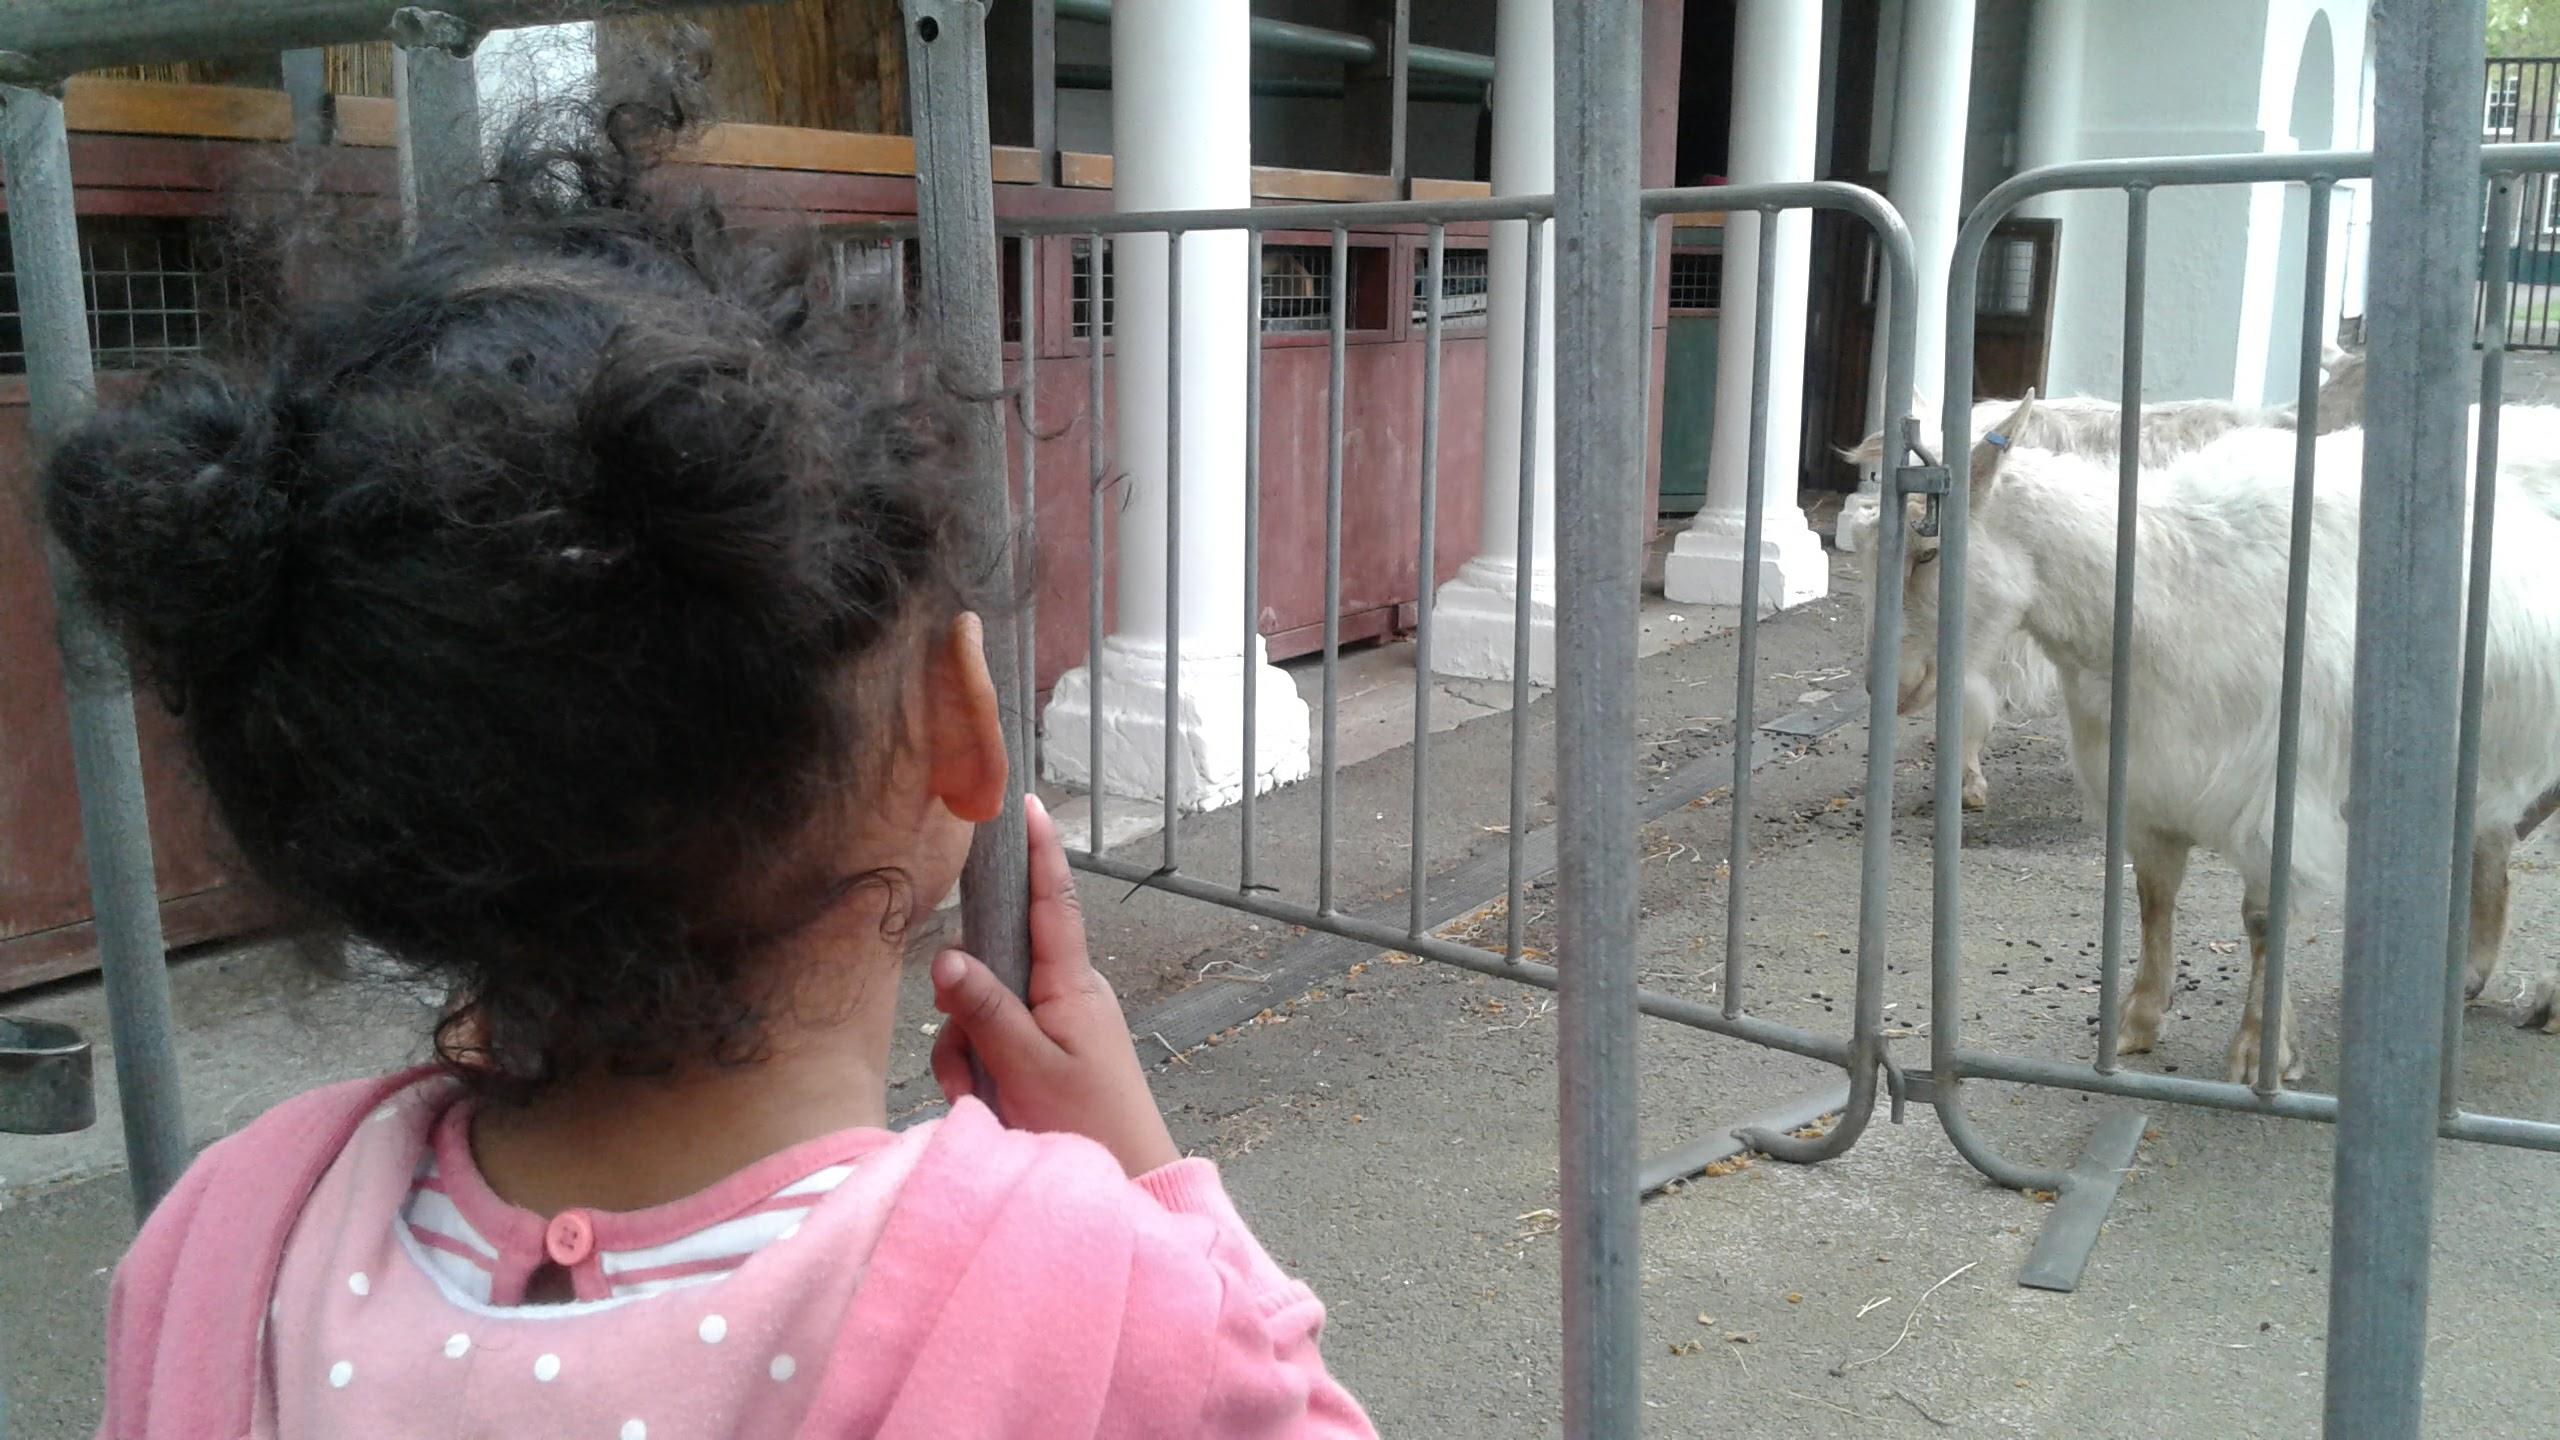 #TearsIntoSmiles with Elastoplast at Coramsfields | London